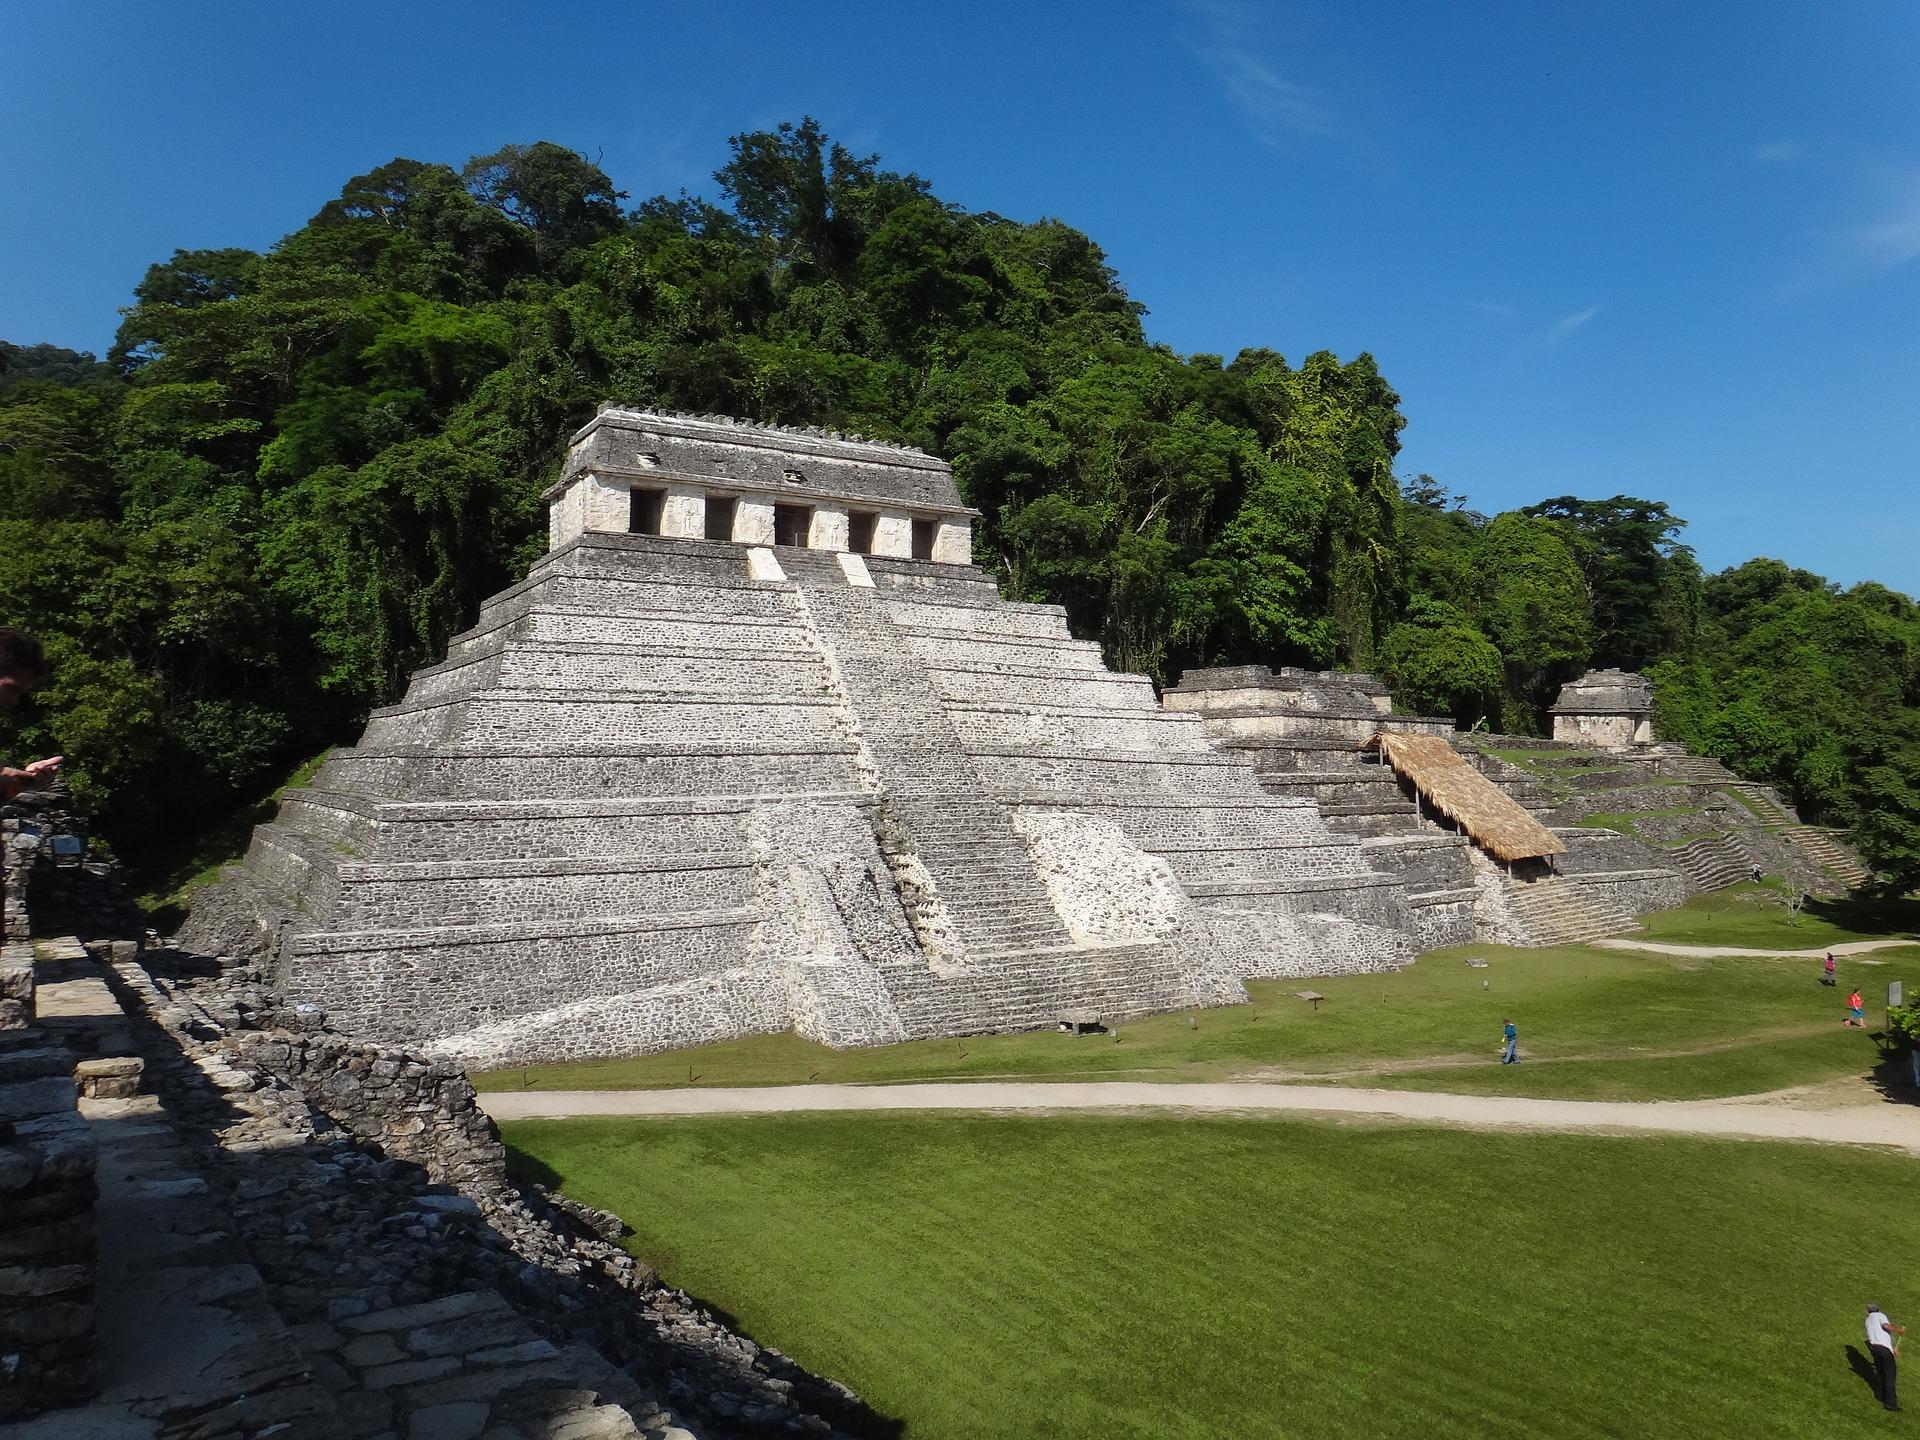 mexico-2308229_1920.jpg